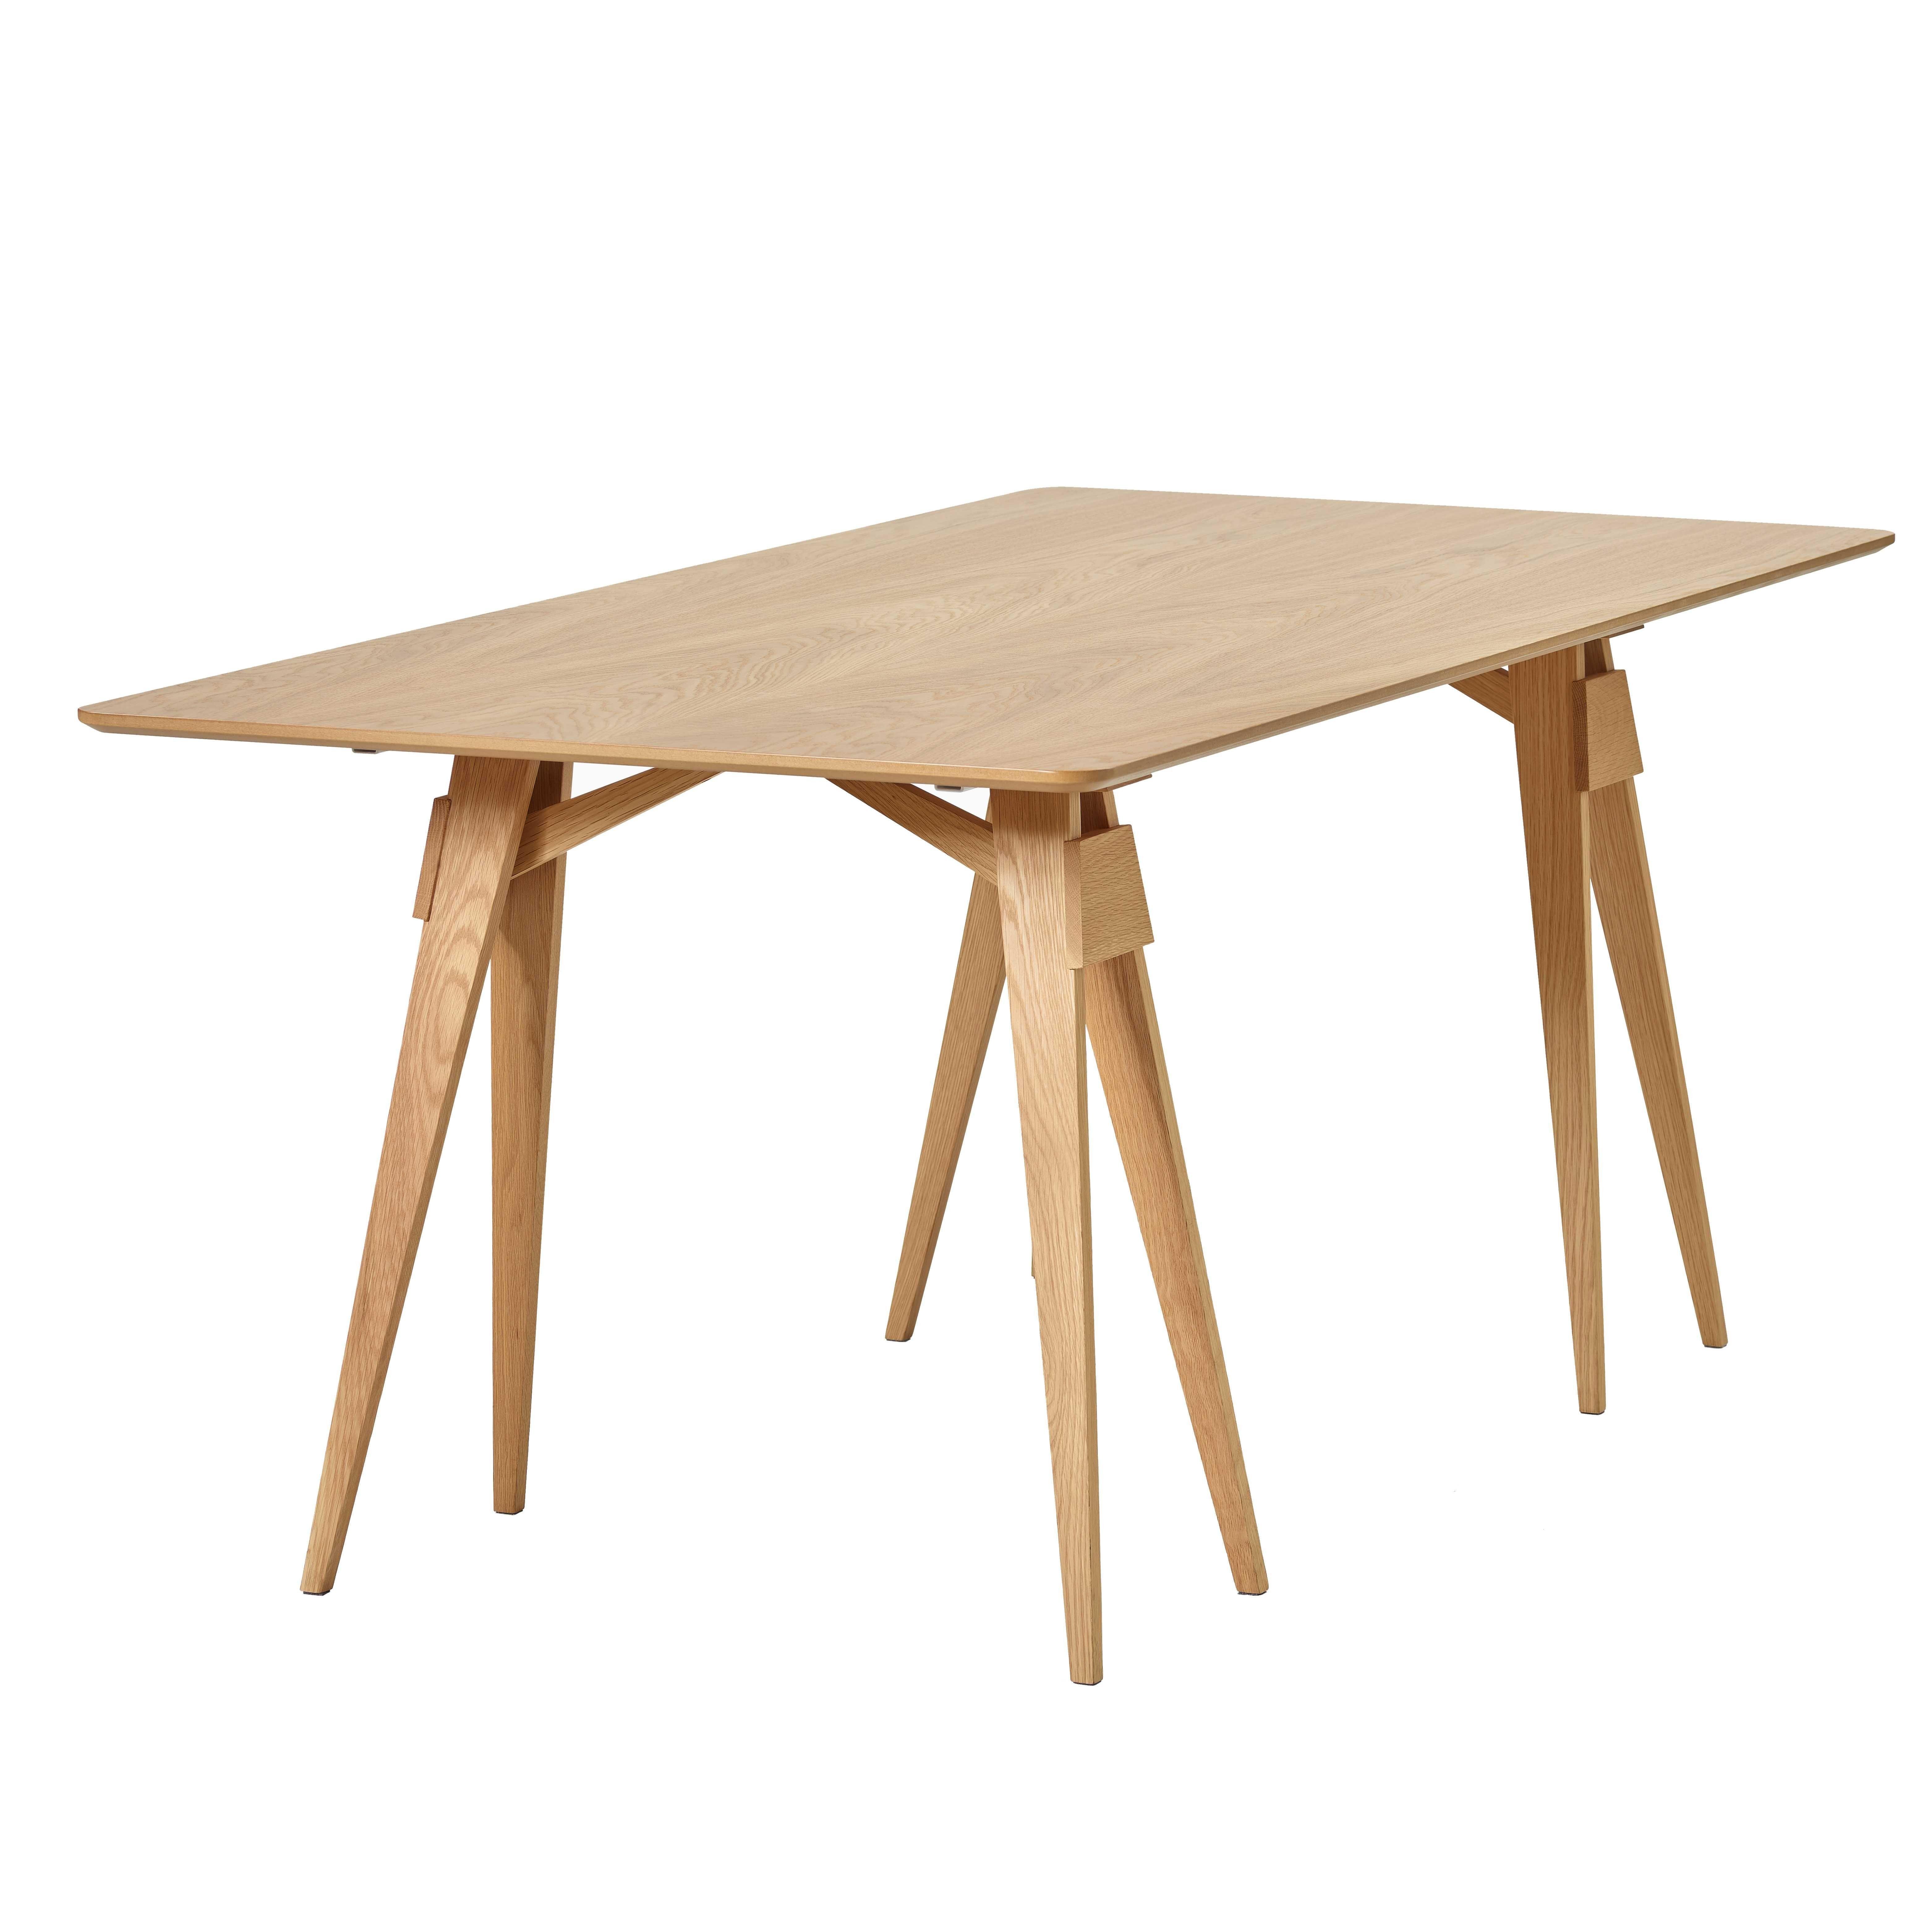 Salontafel Zweeds Design.Design House Stockholm Arco Tafel Eiken 182x91 Cm Flinders